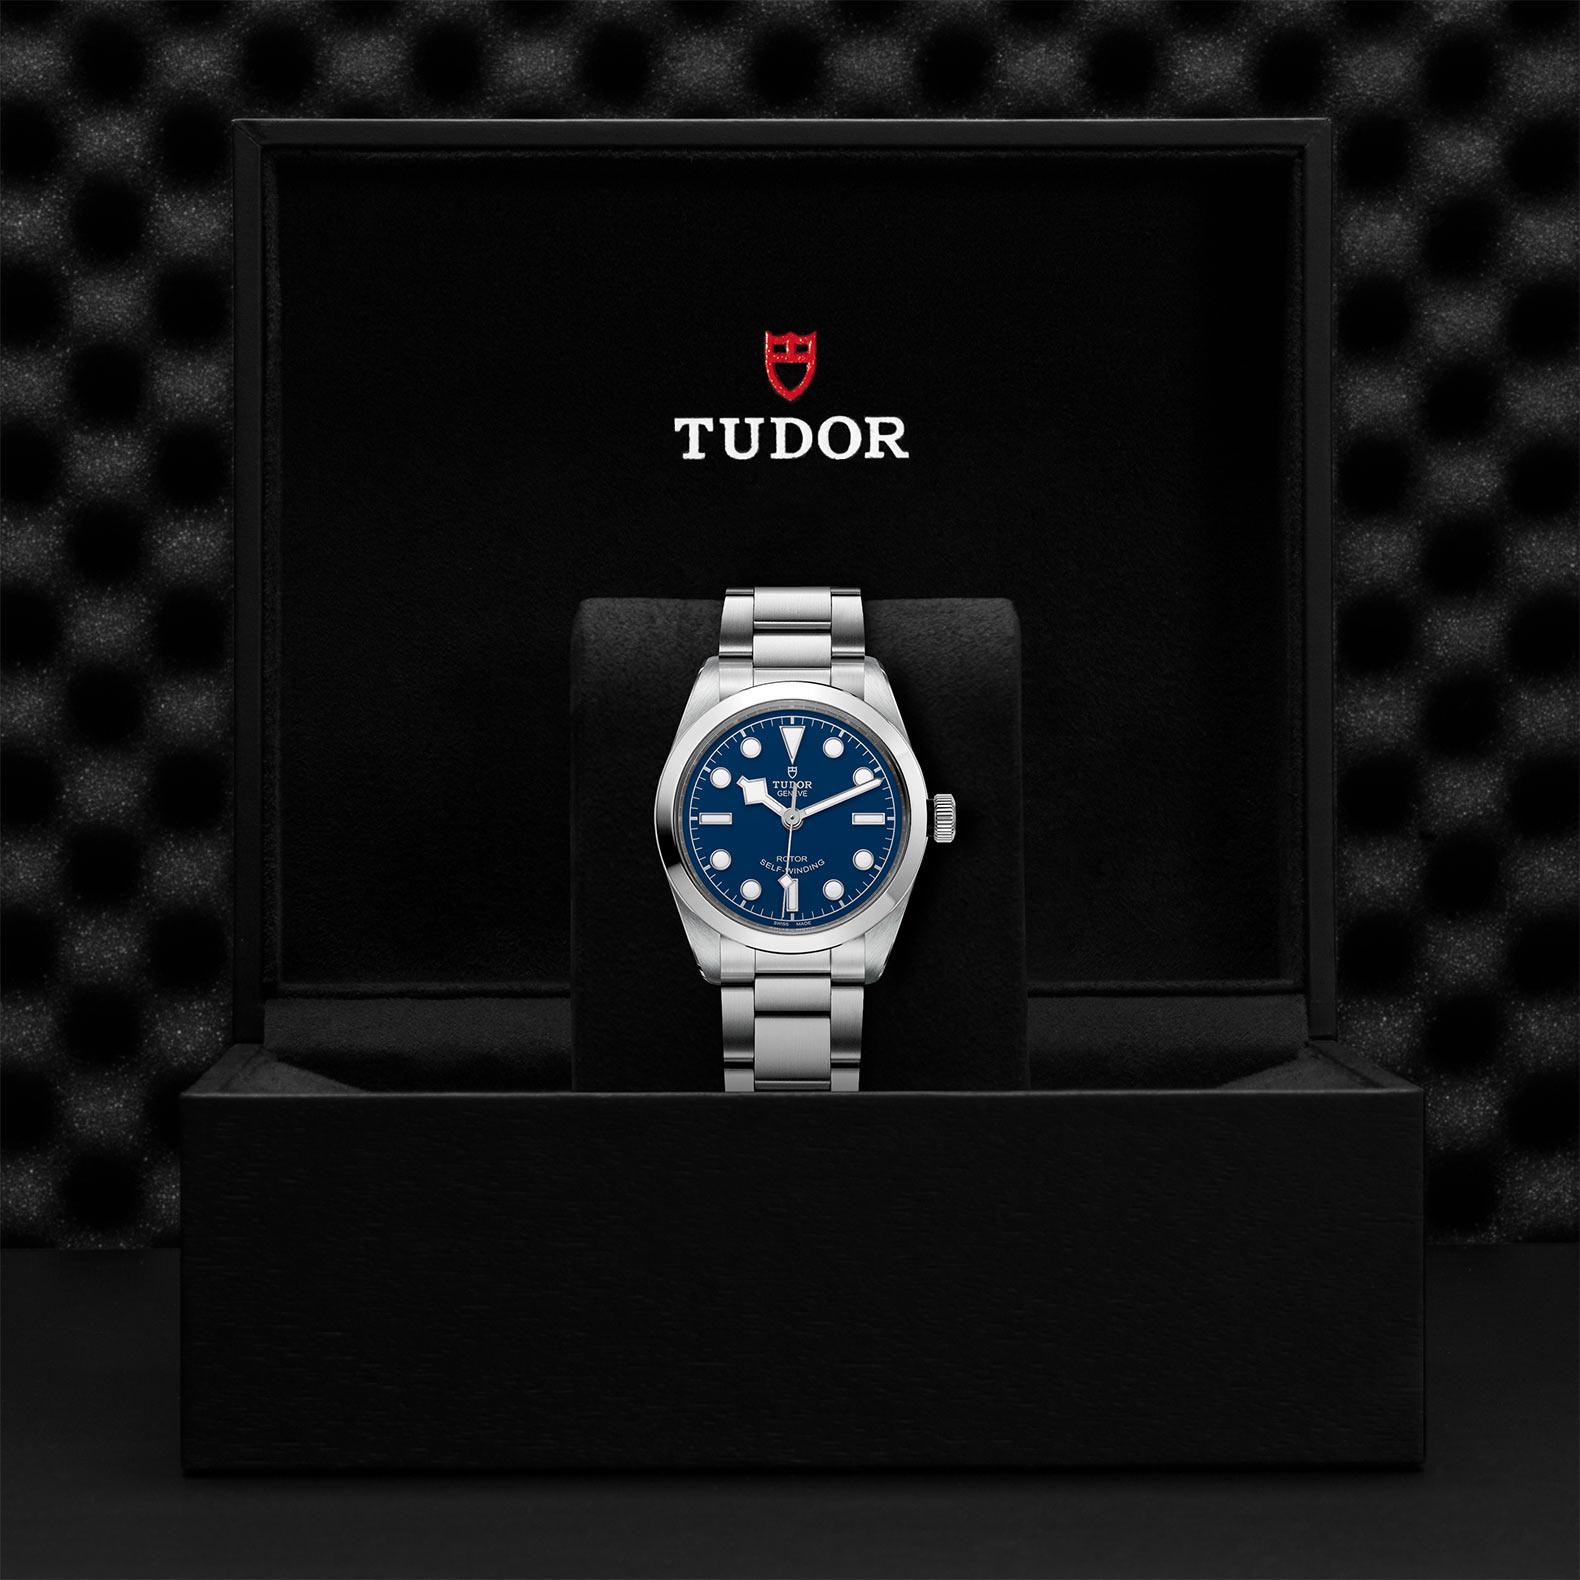 TUDOR Black Bay 36 - M79500-0004